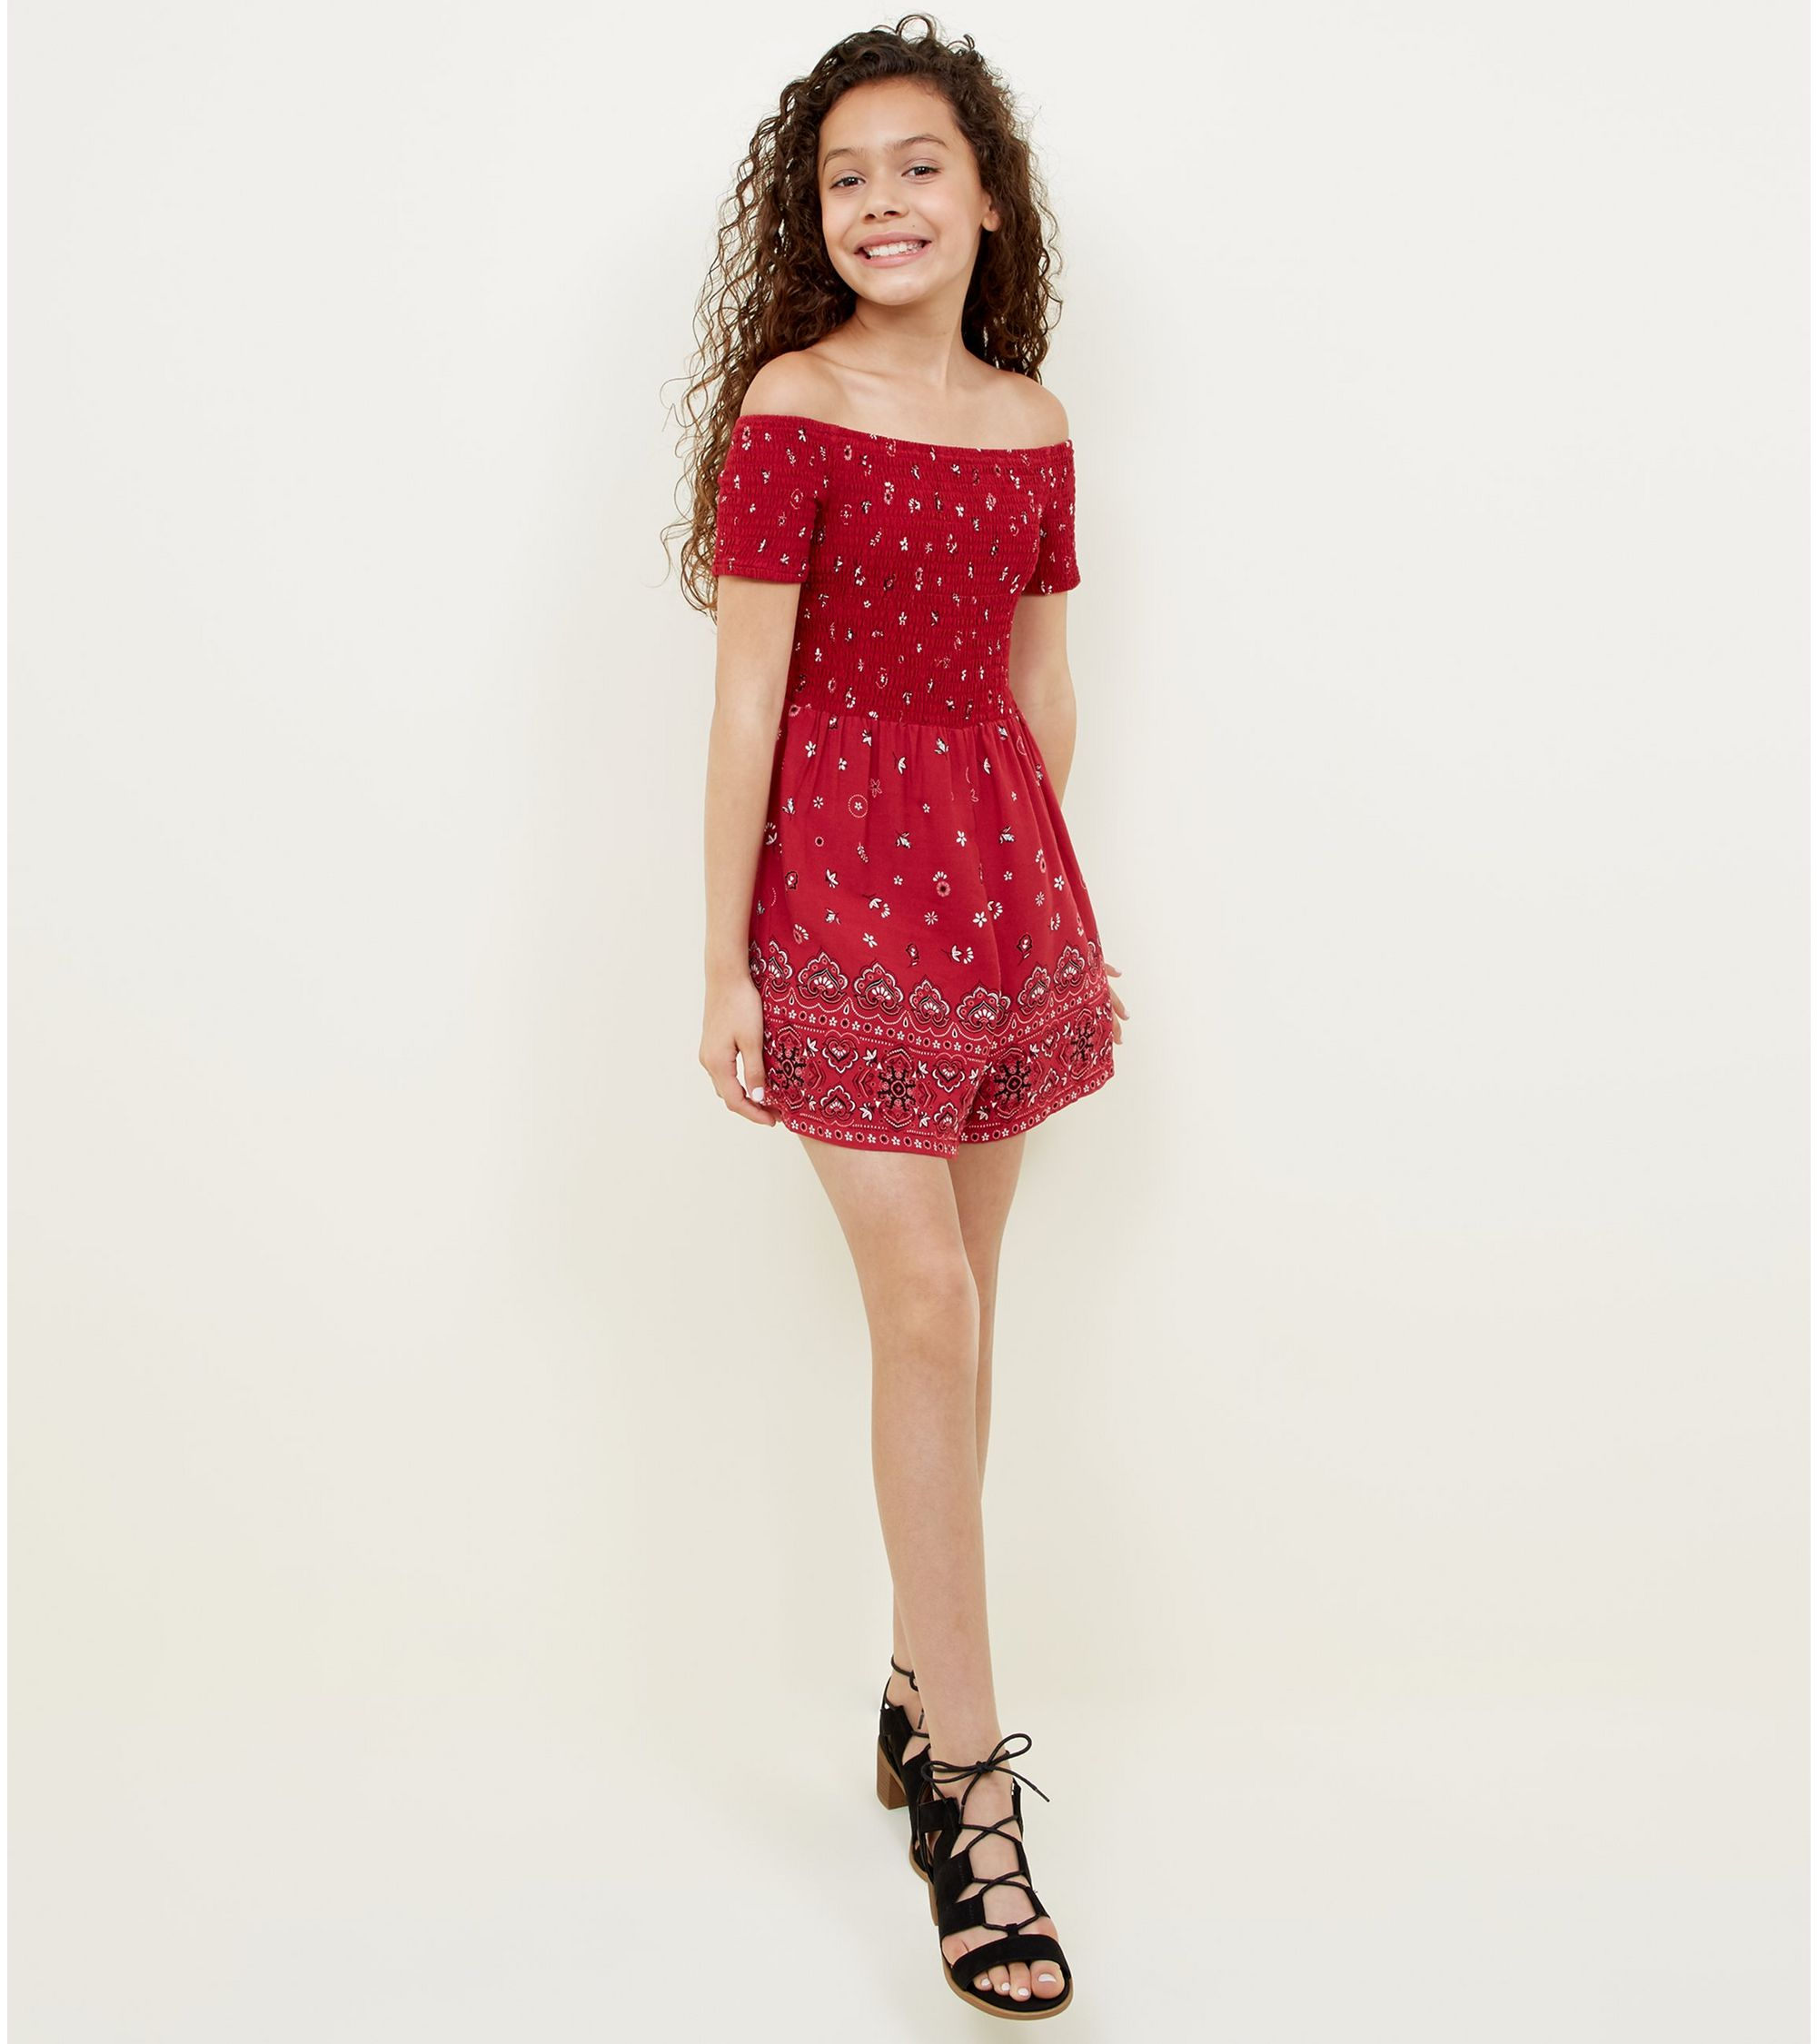 b6d6271ea6f New Look Teens Red Folk Floral Print Bardot Playsuit at £15.99 ...